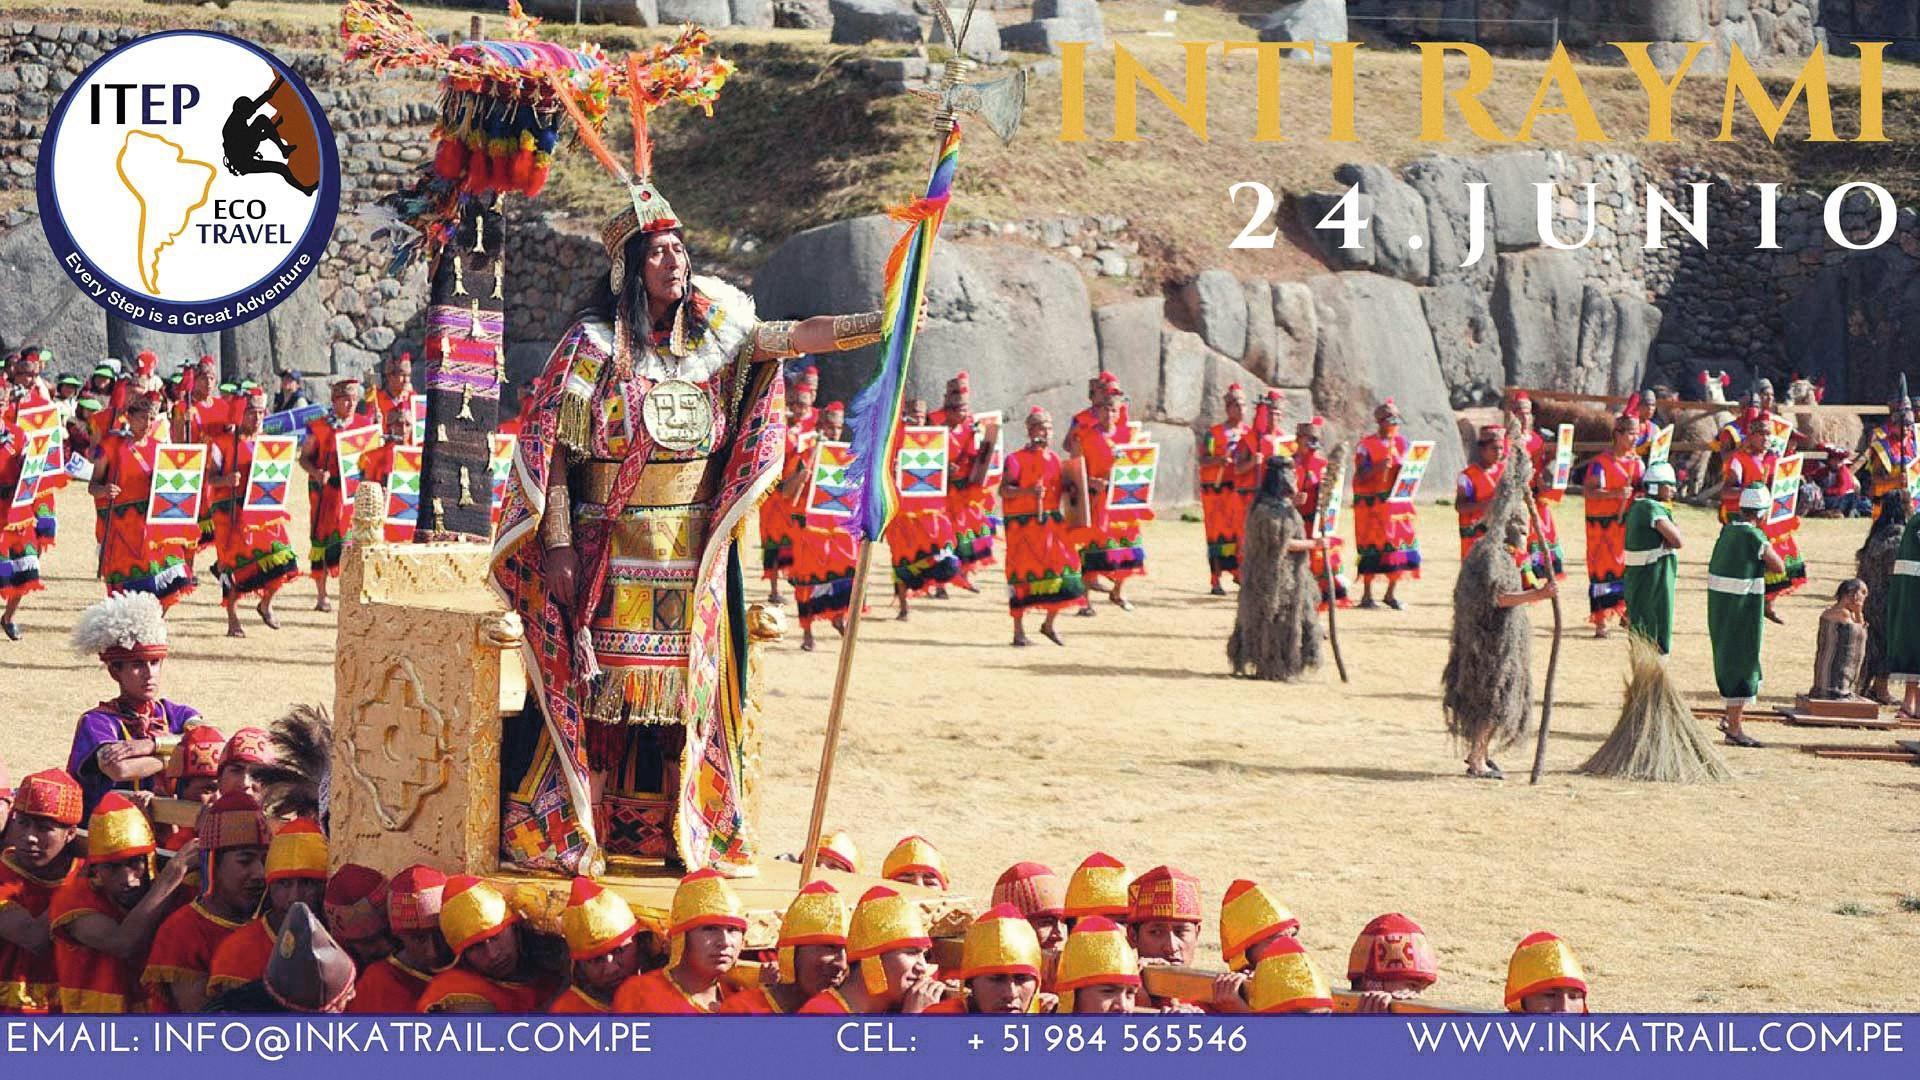 Cartel promocional Inkatrail, Inti Raymi, 2018.